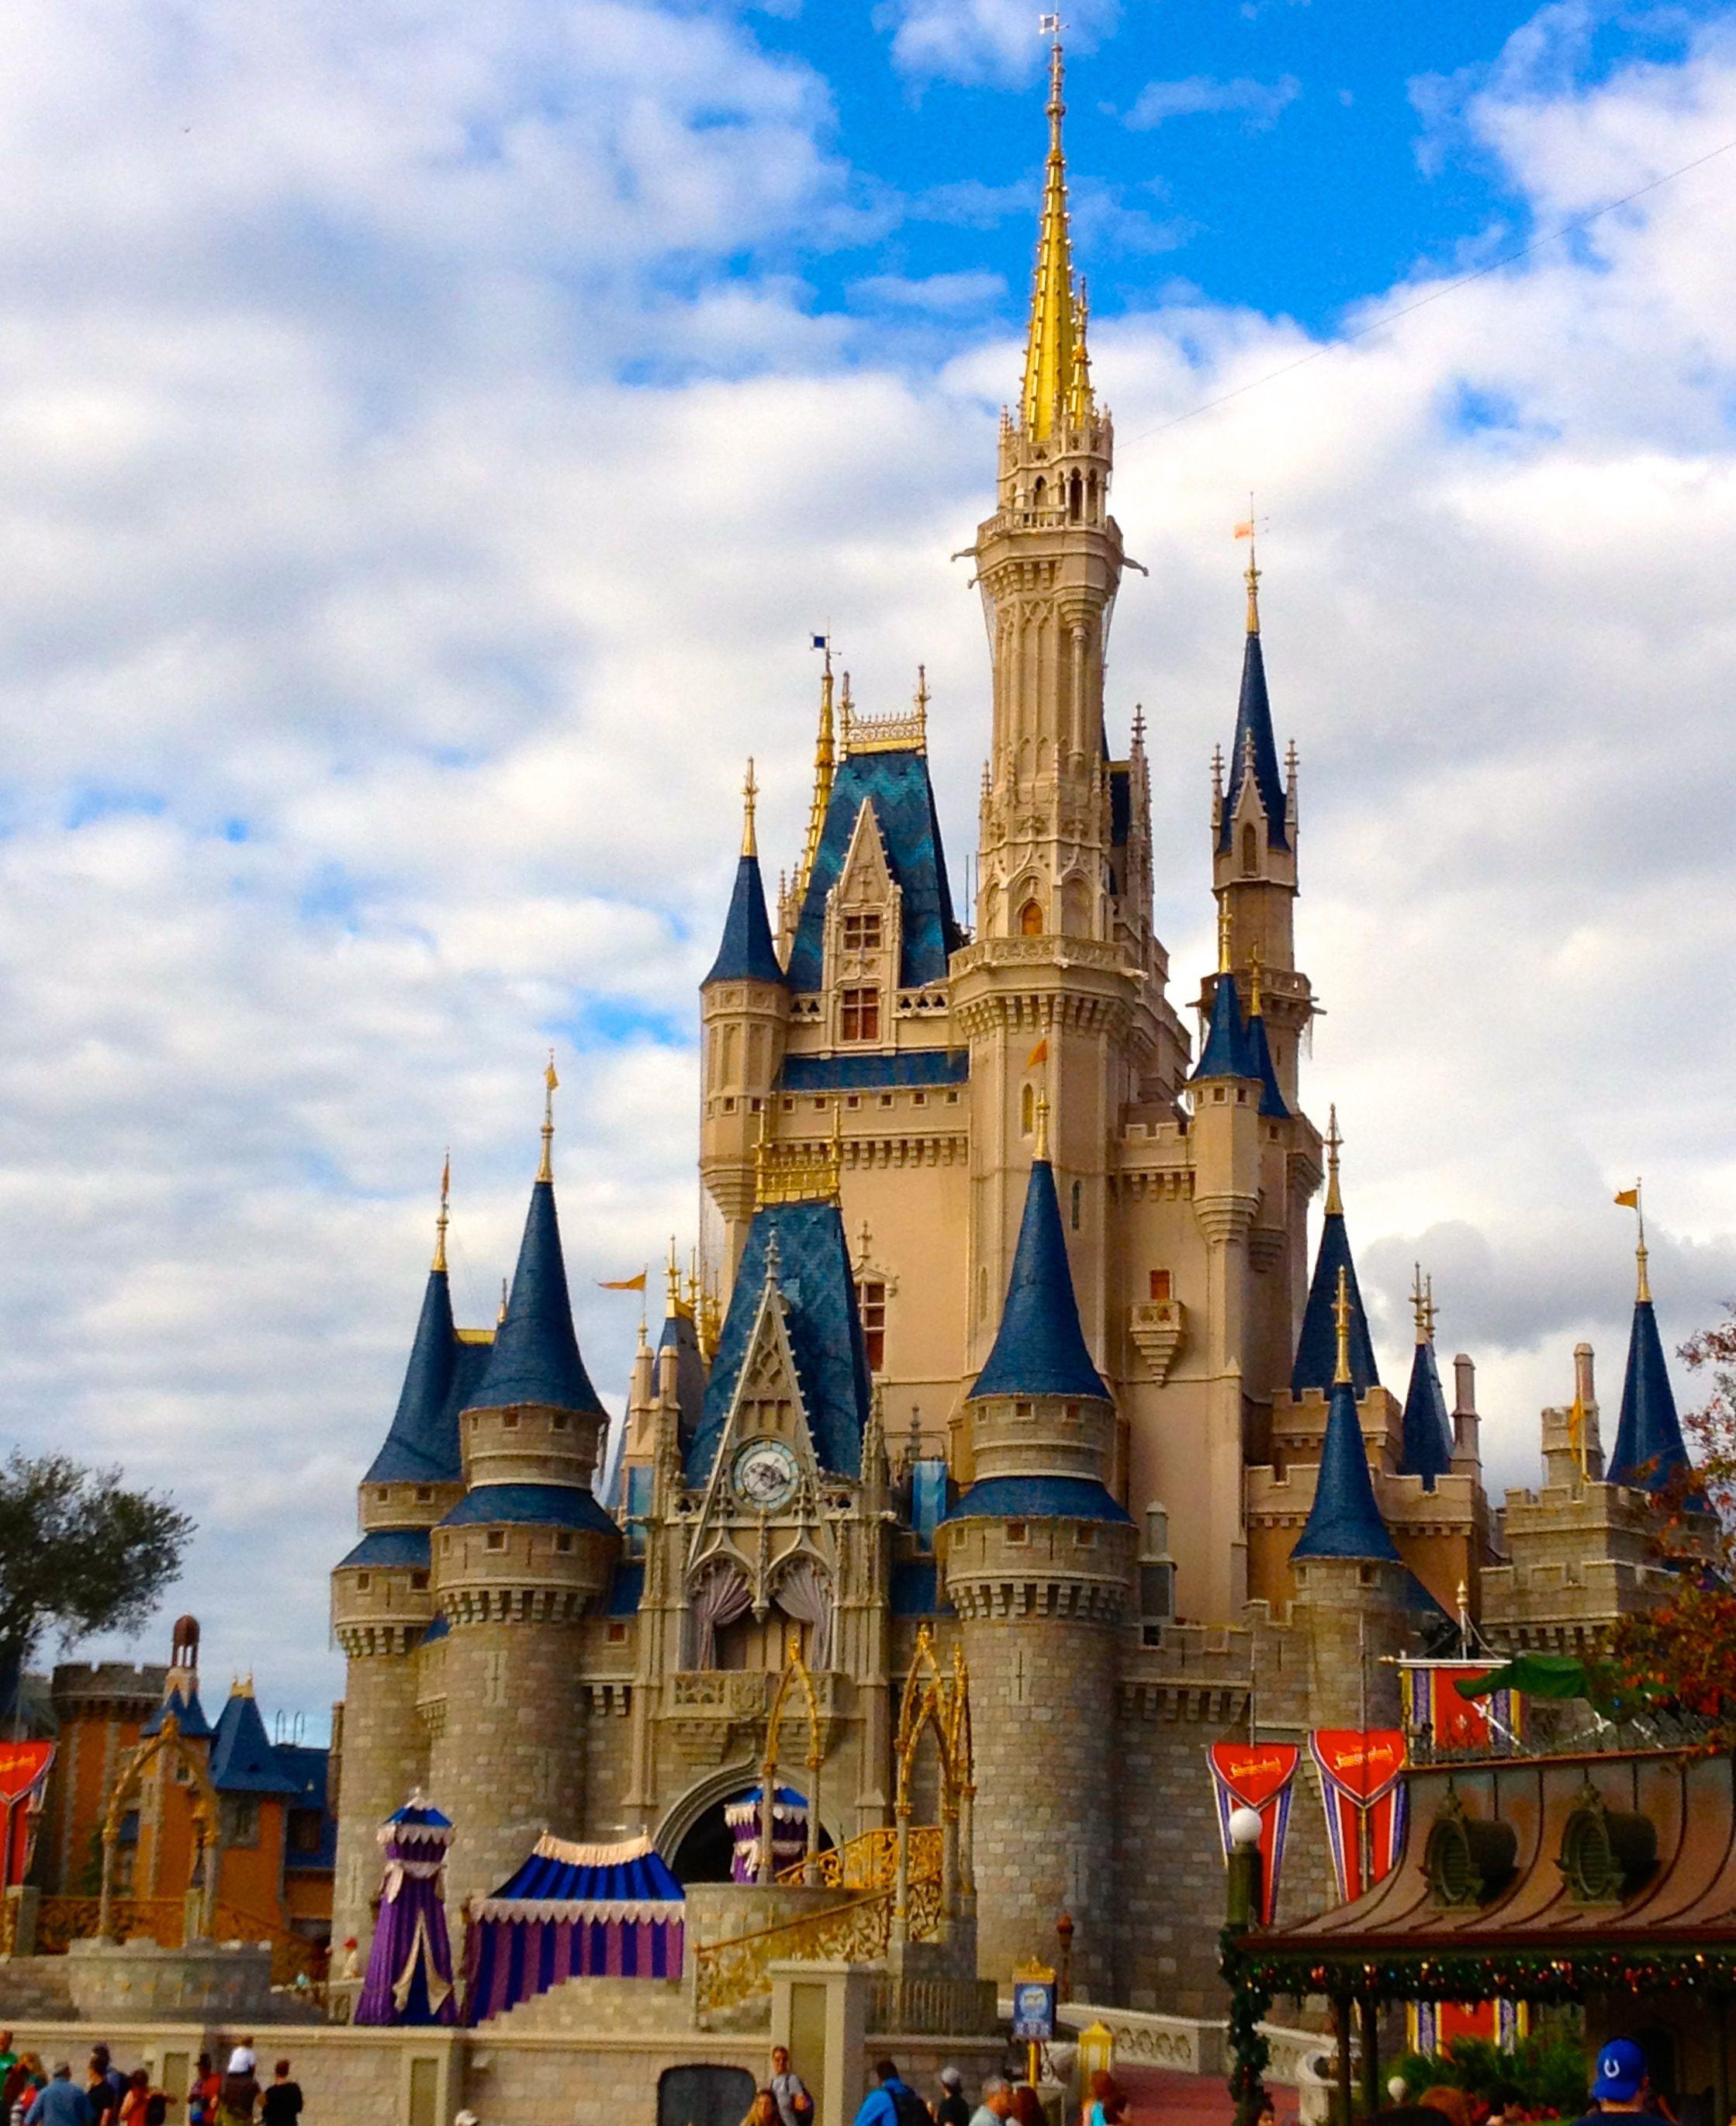 new fantasyland pictures in disney world  Disneys New